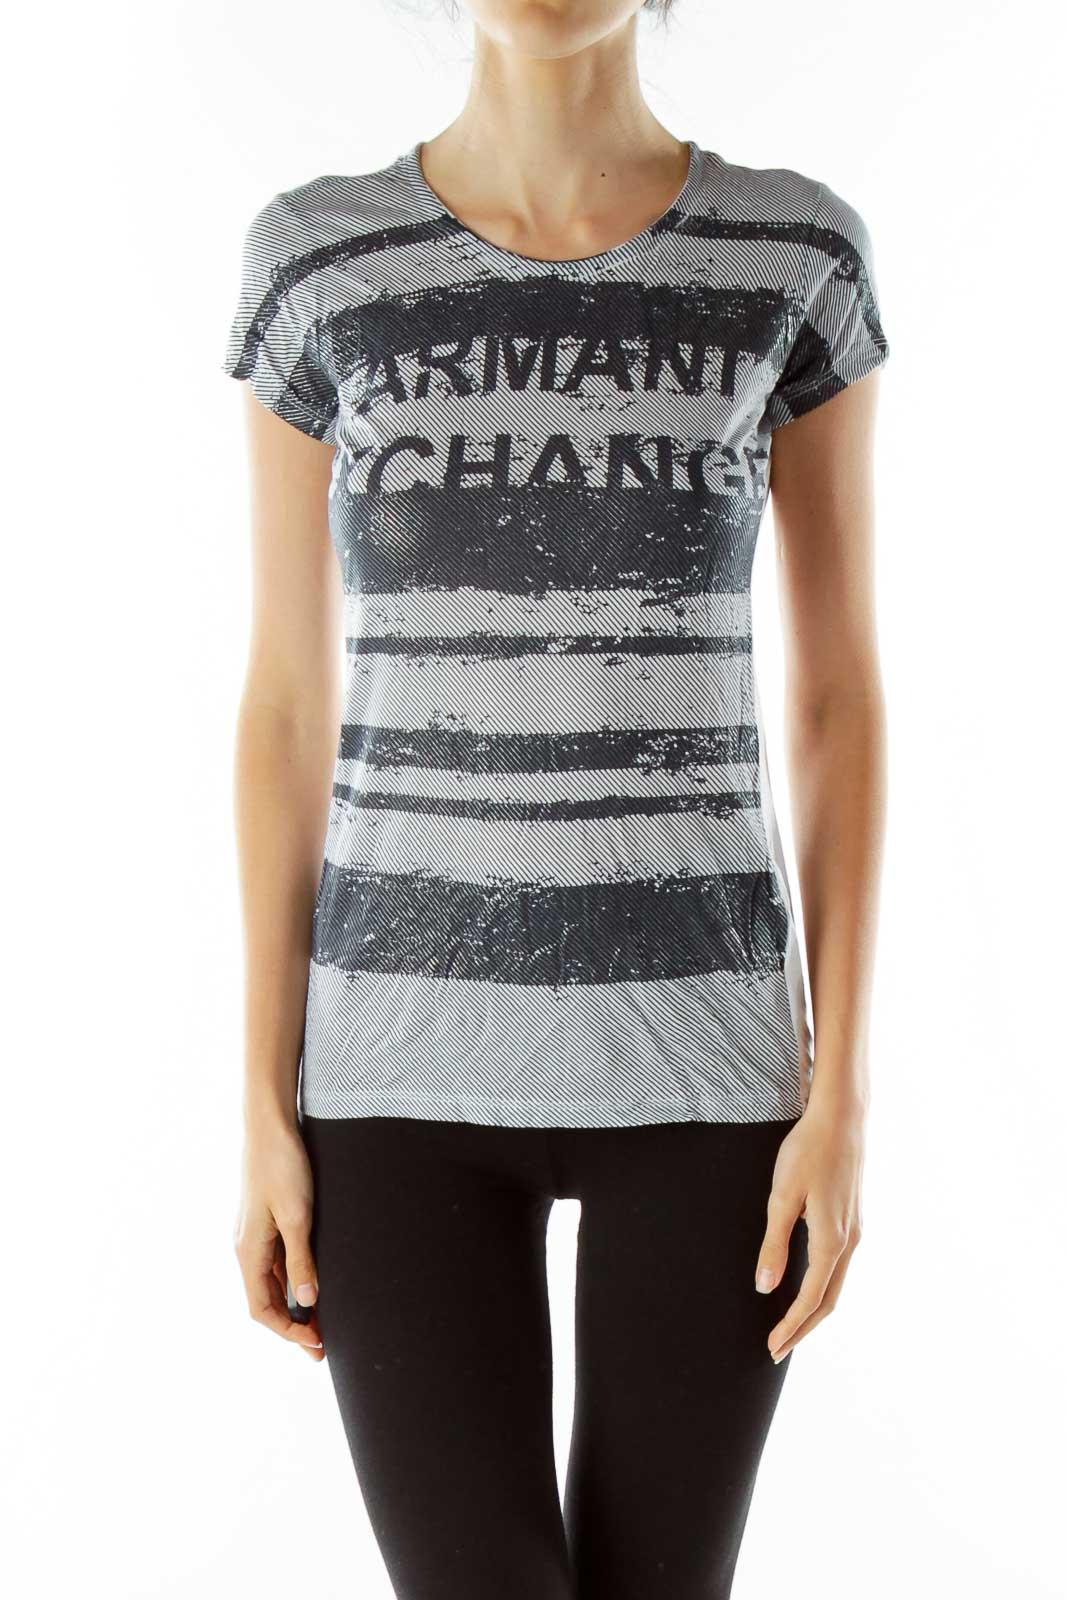 Navy White Shimmer Striped T-Shirt